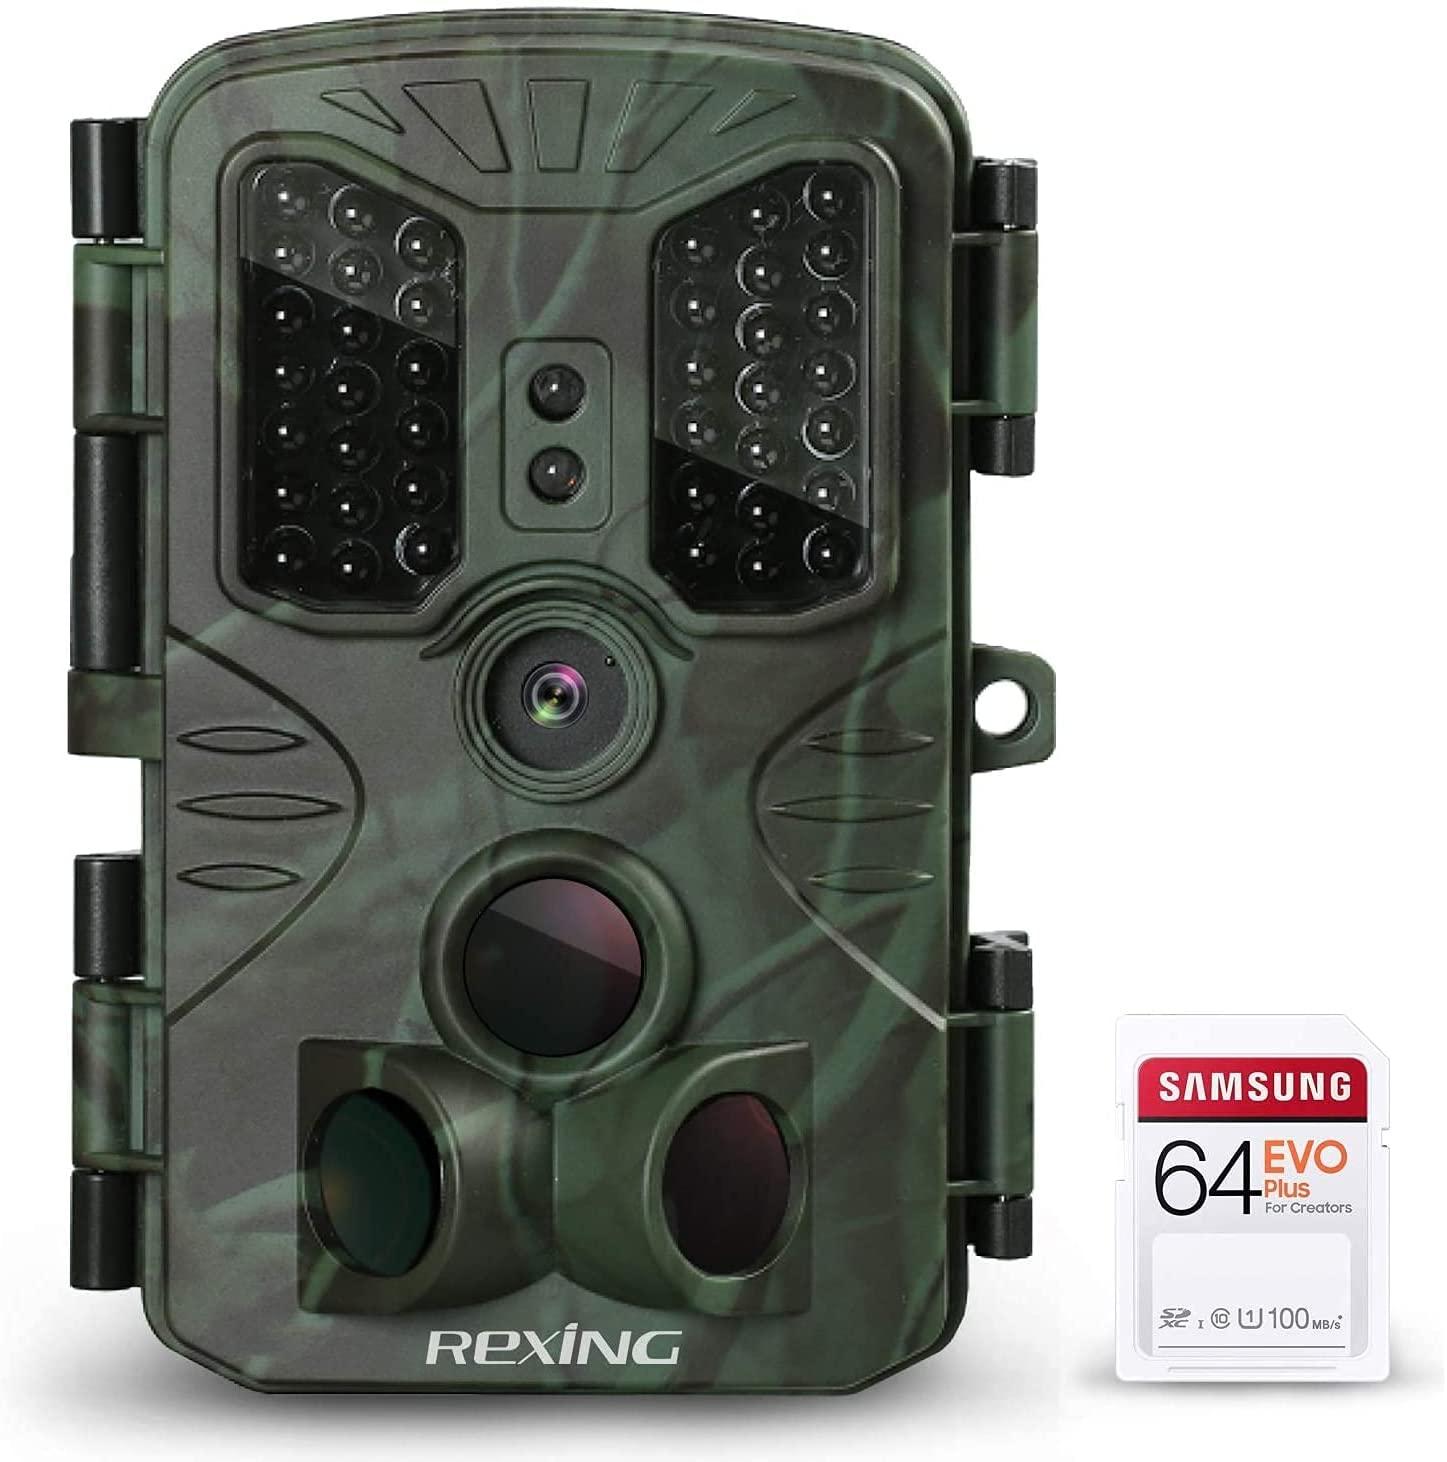 Rexing DashCam coupon: REXING H1 Blackhawk Night Vision Trail Camera